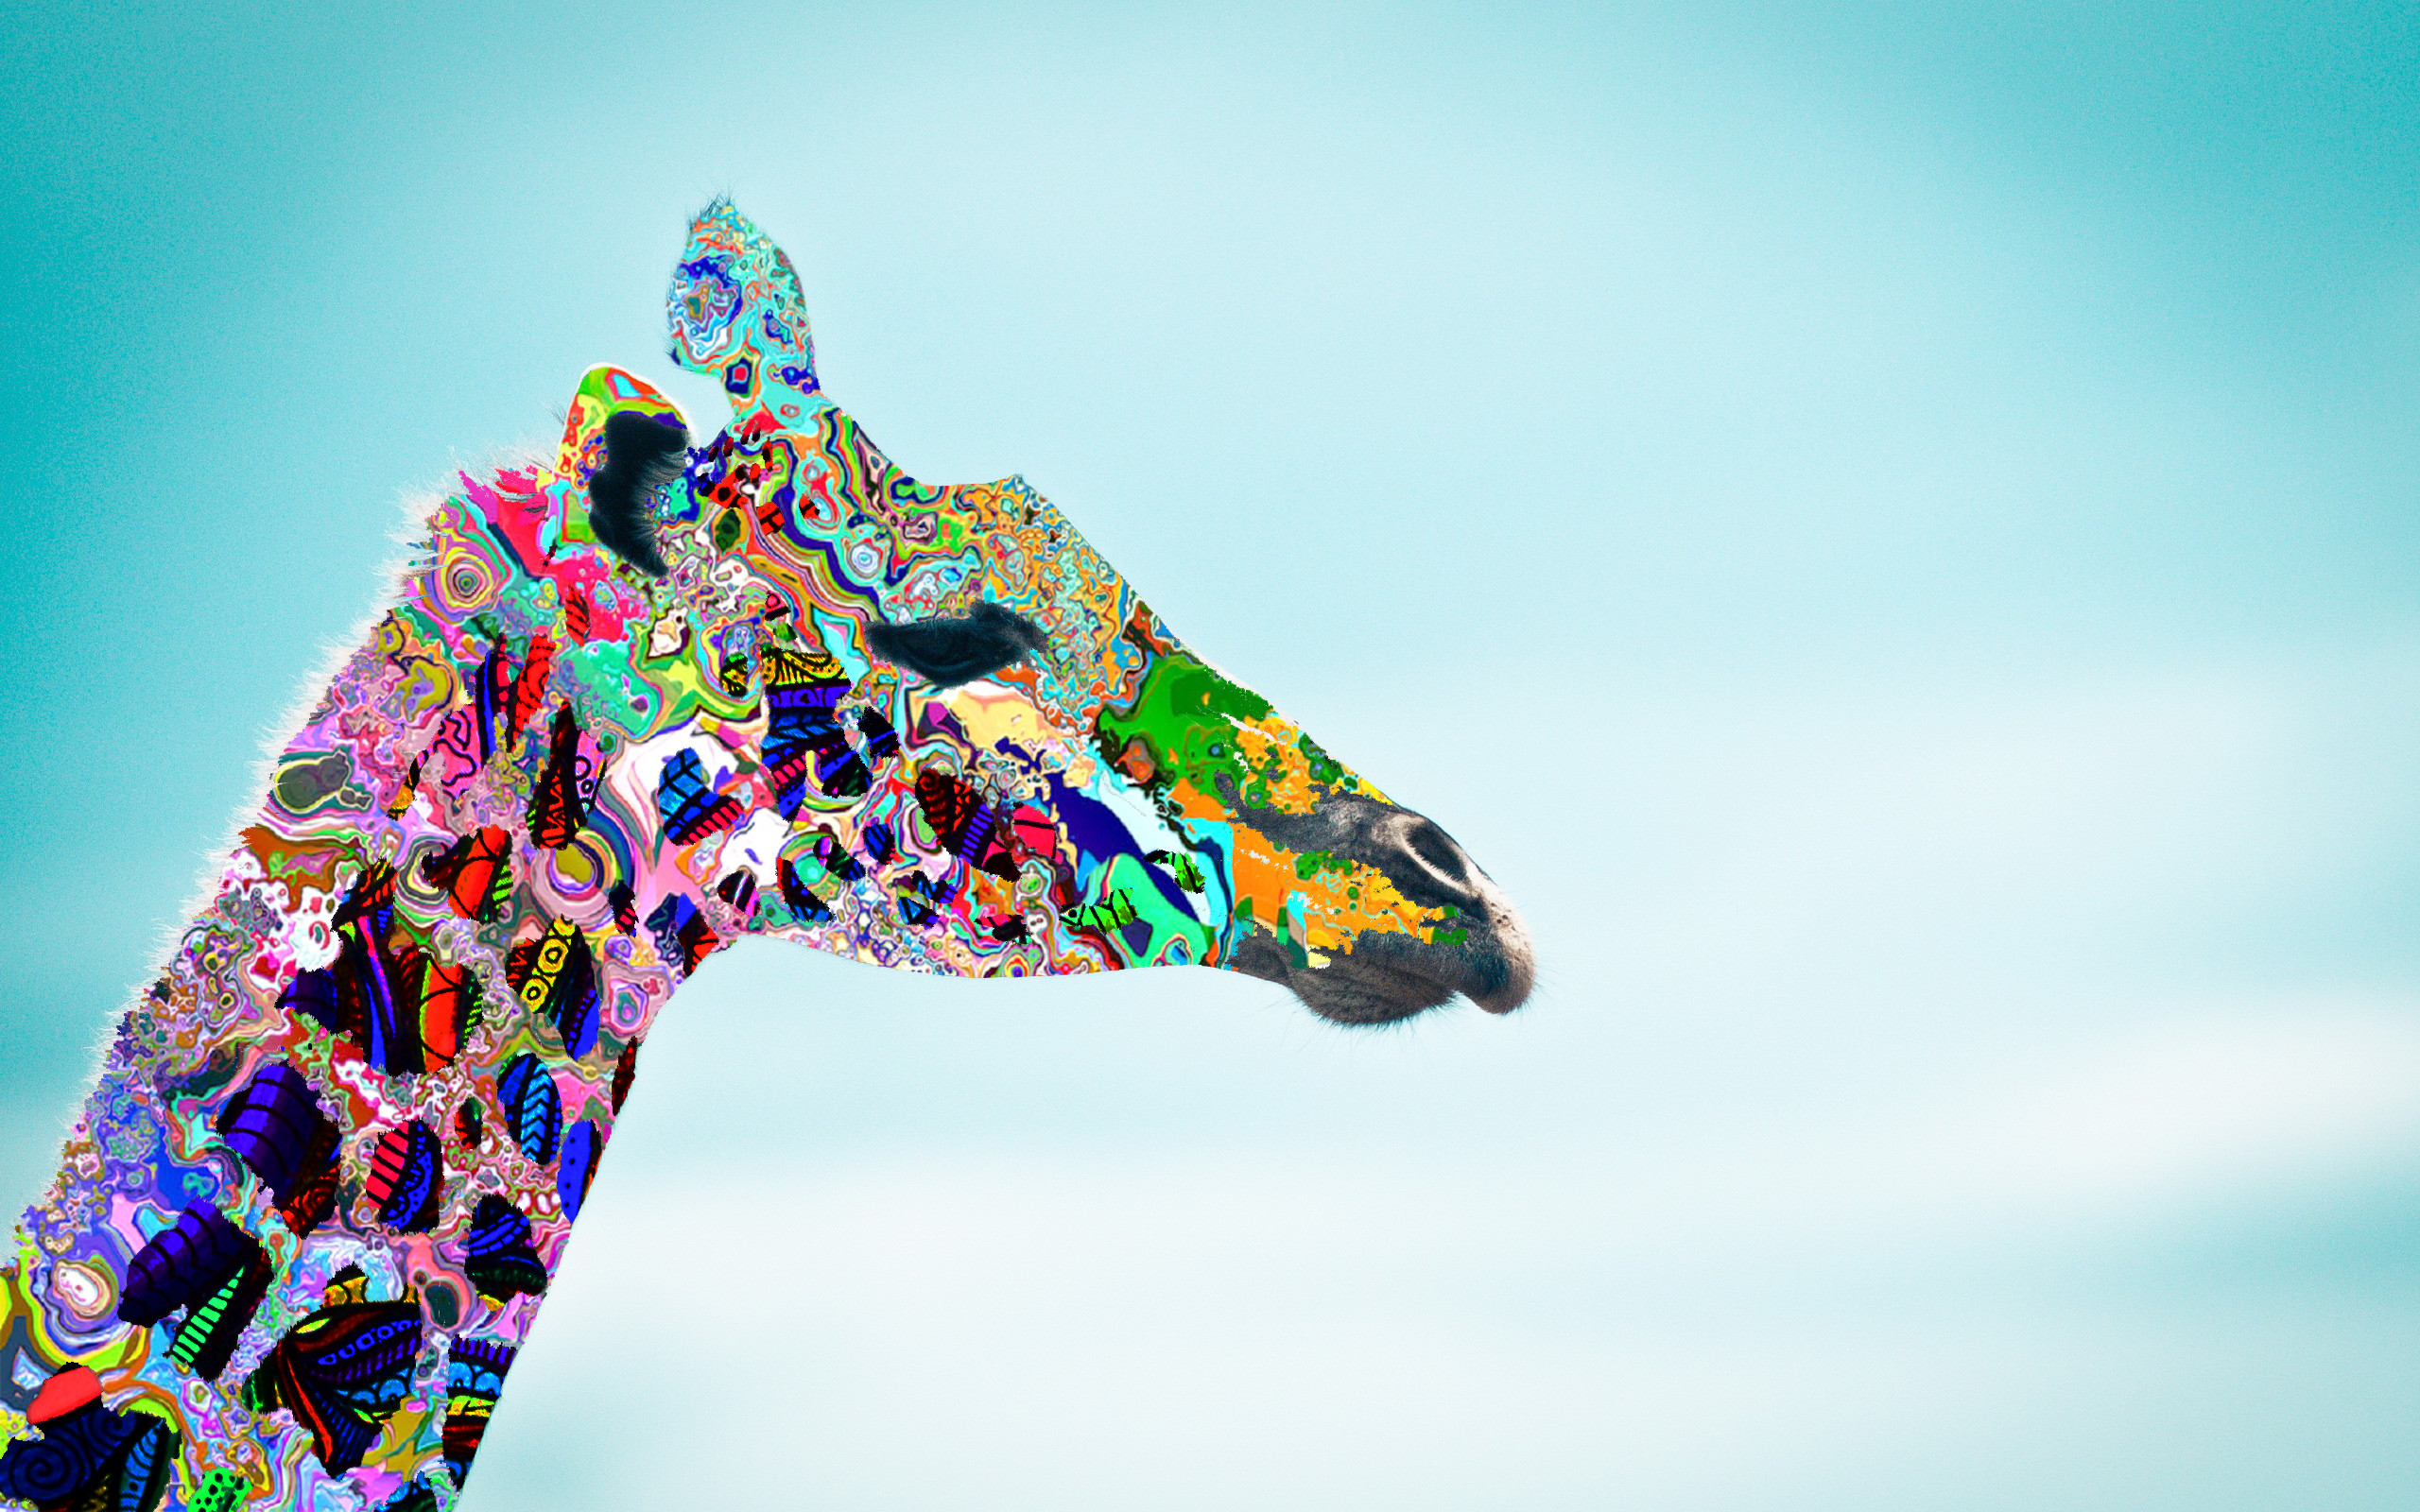 Psychedelic Giraffe Wallpaper